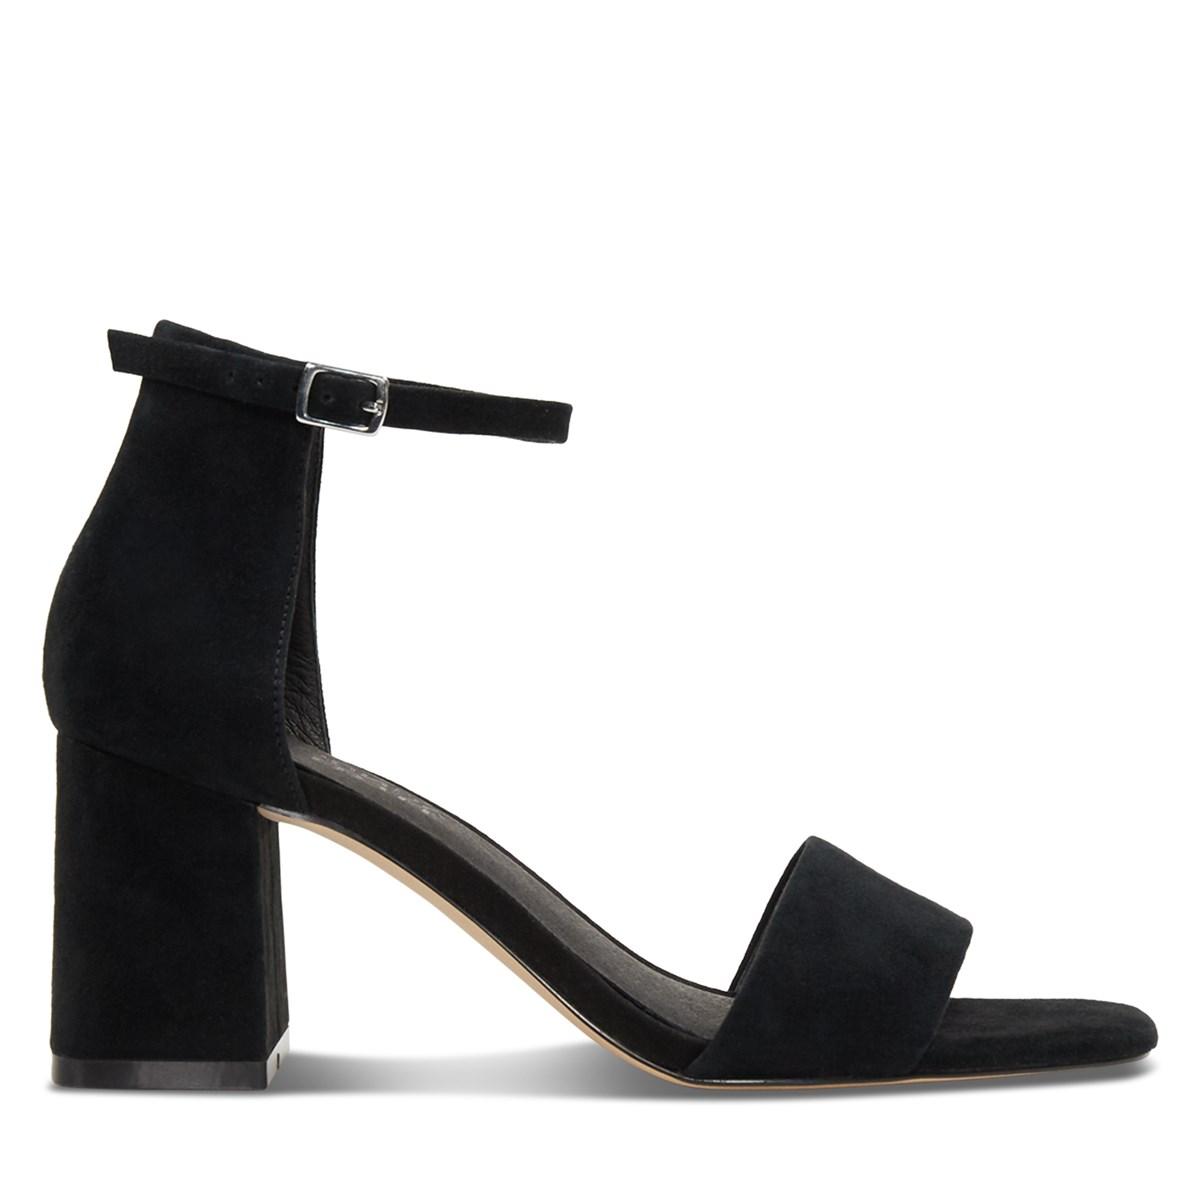 Women's Alessia Heeled Sandals in Black